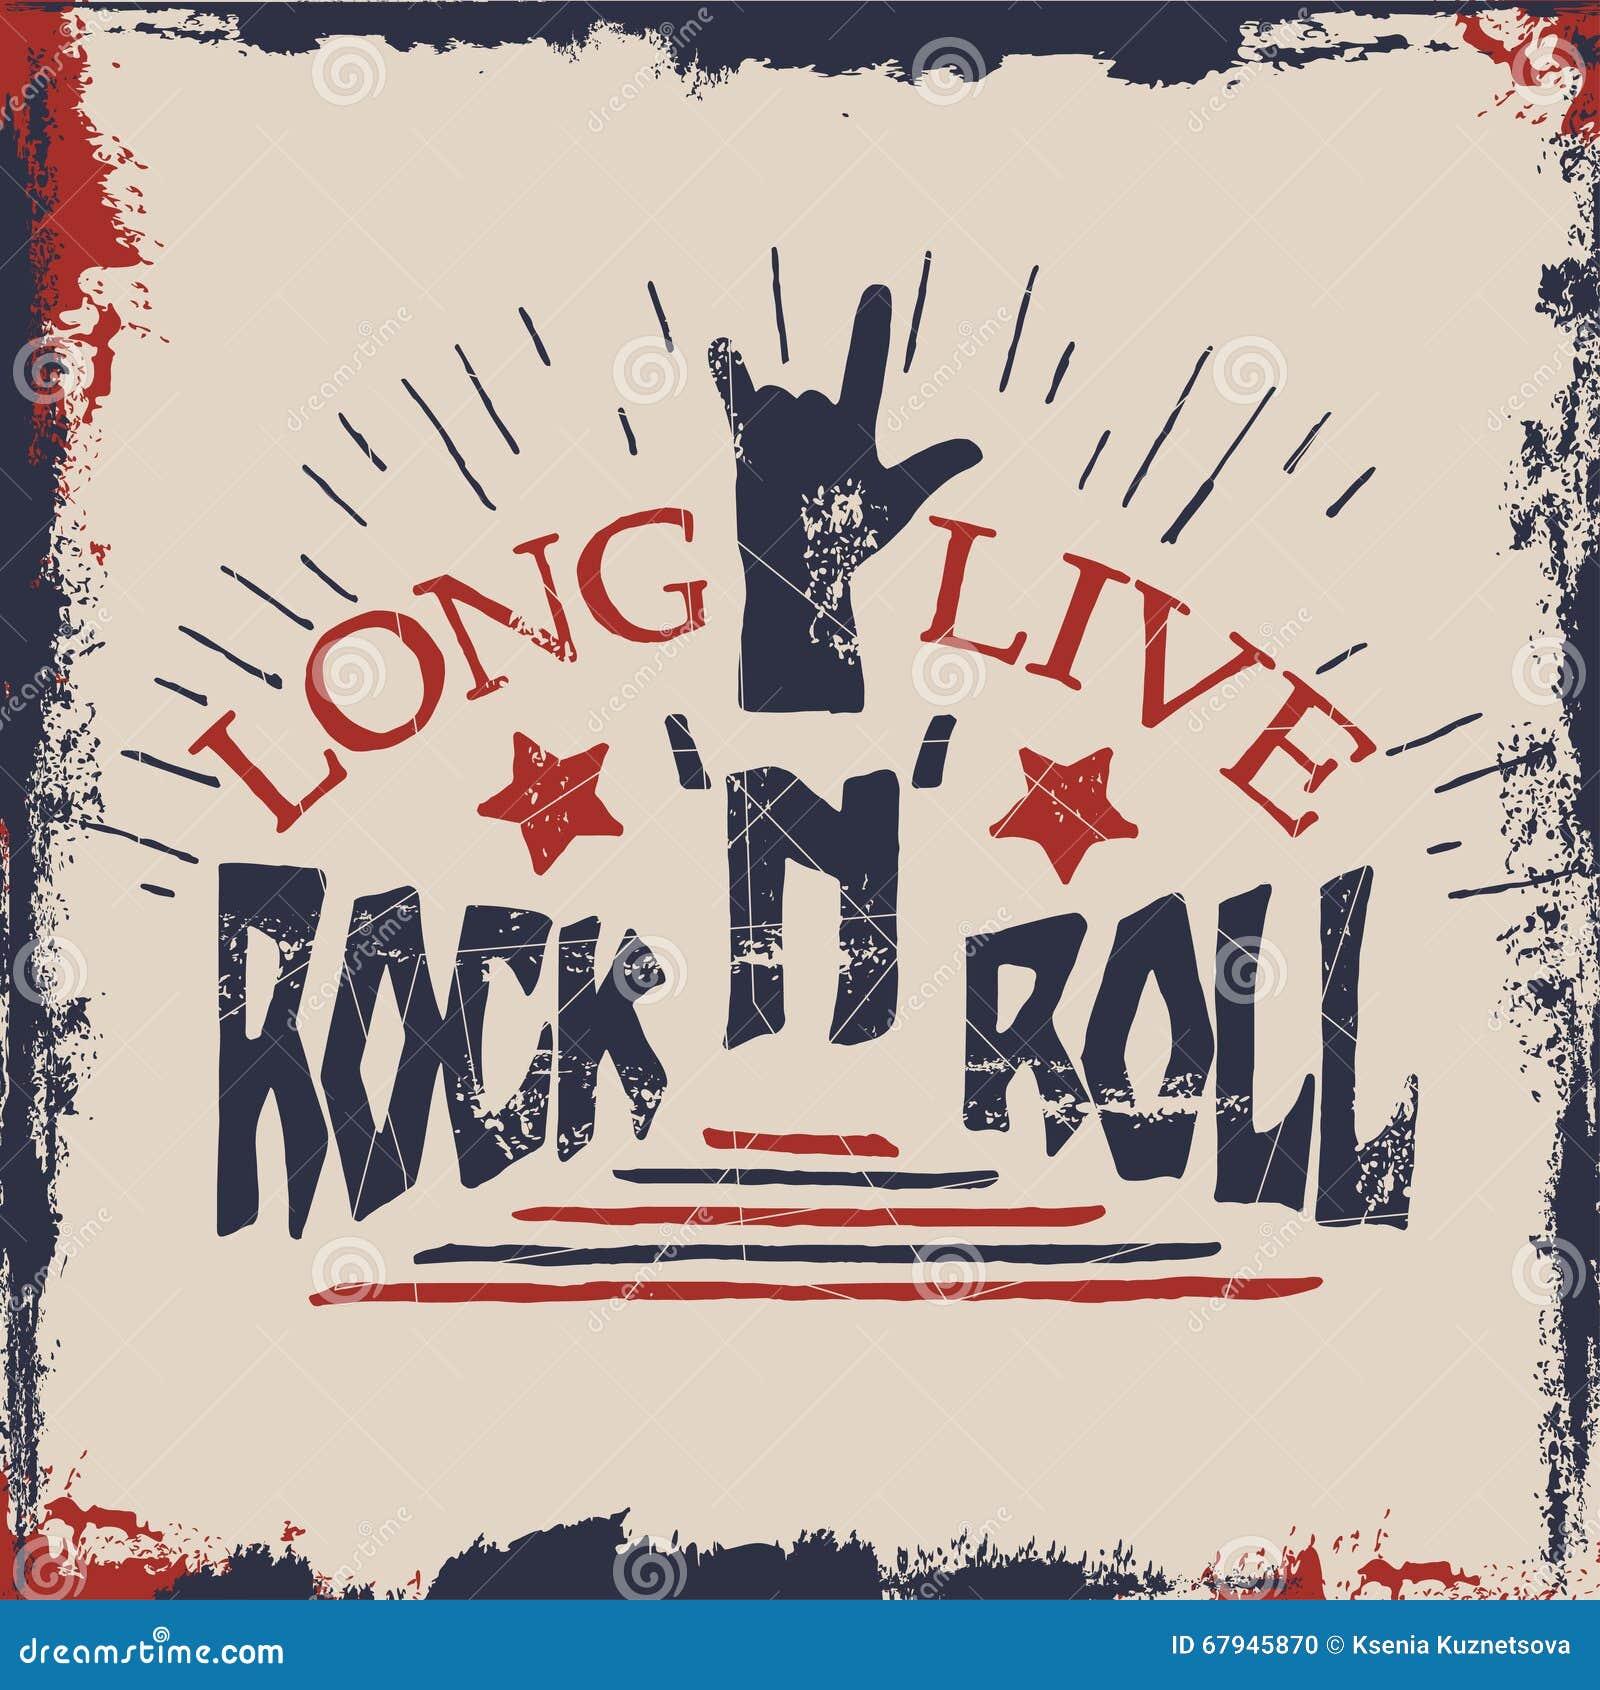 Rock n roll poster design - Design Hand Illustration Label Lettering Live Musical Quote Rock Roll